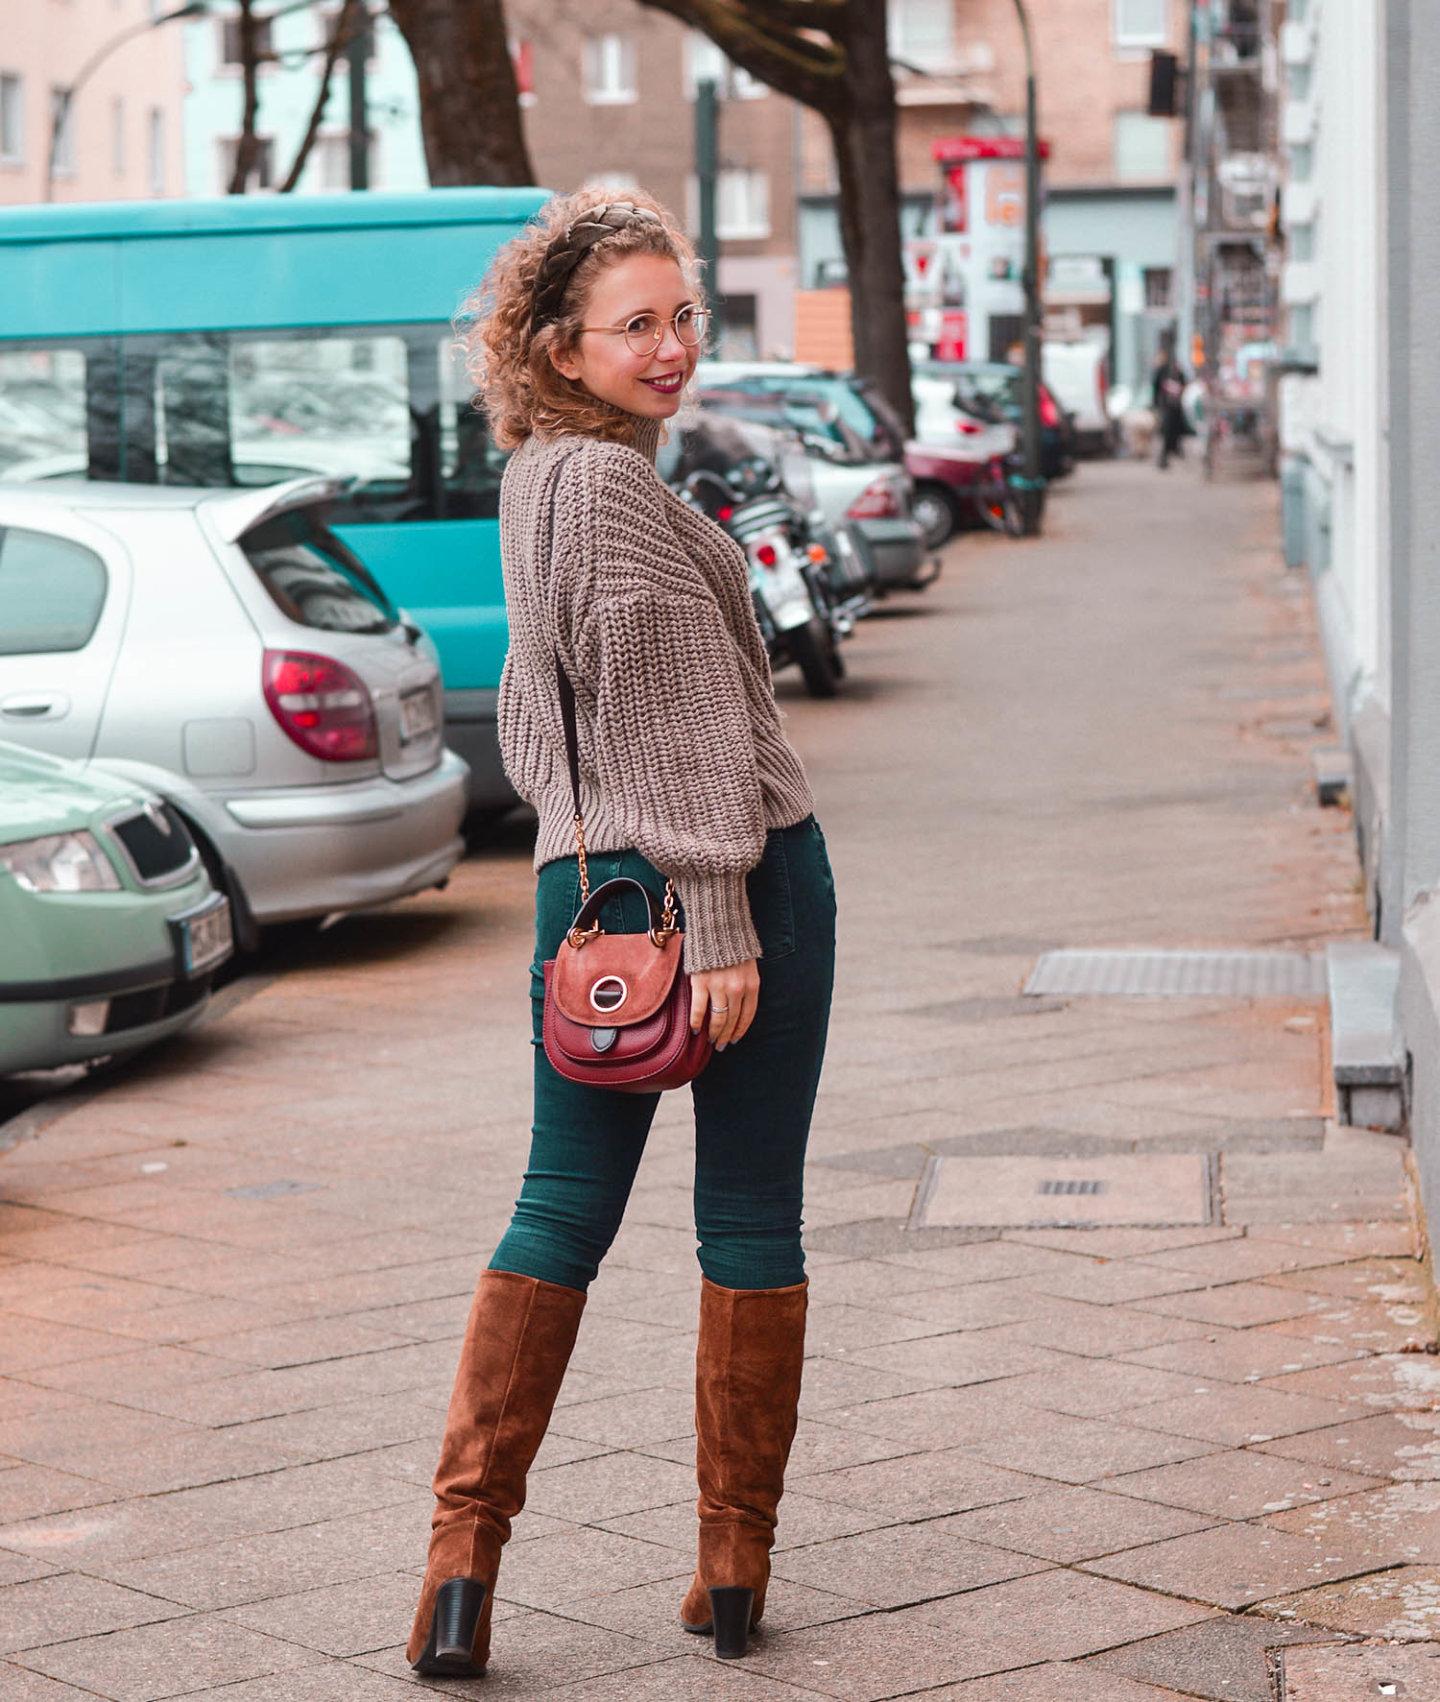 Jeans-Stiefel-Kombi und Saddle Bag